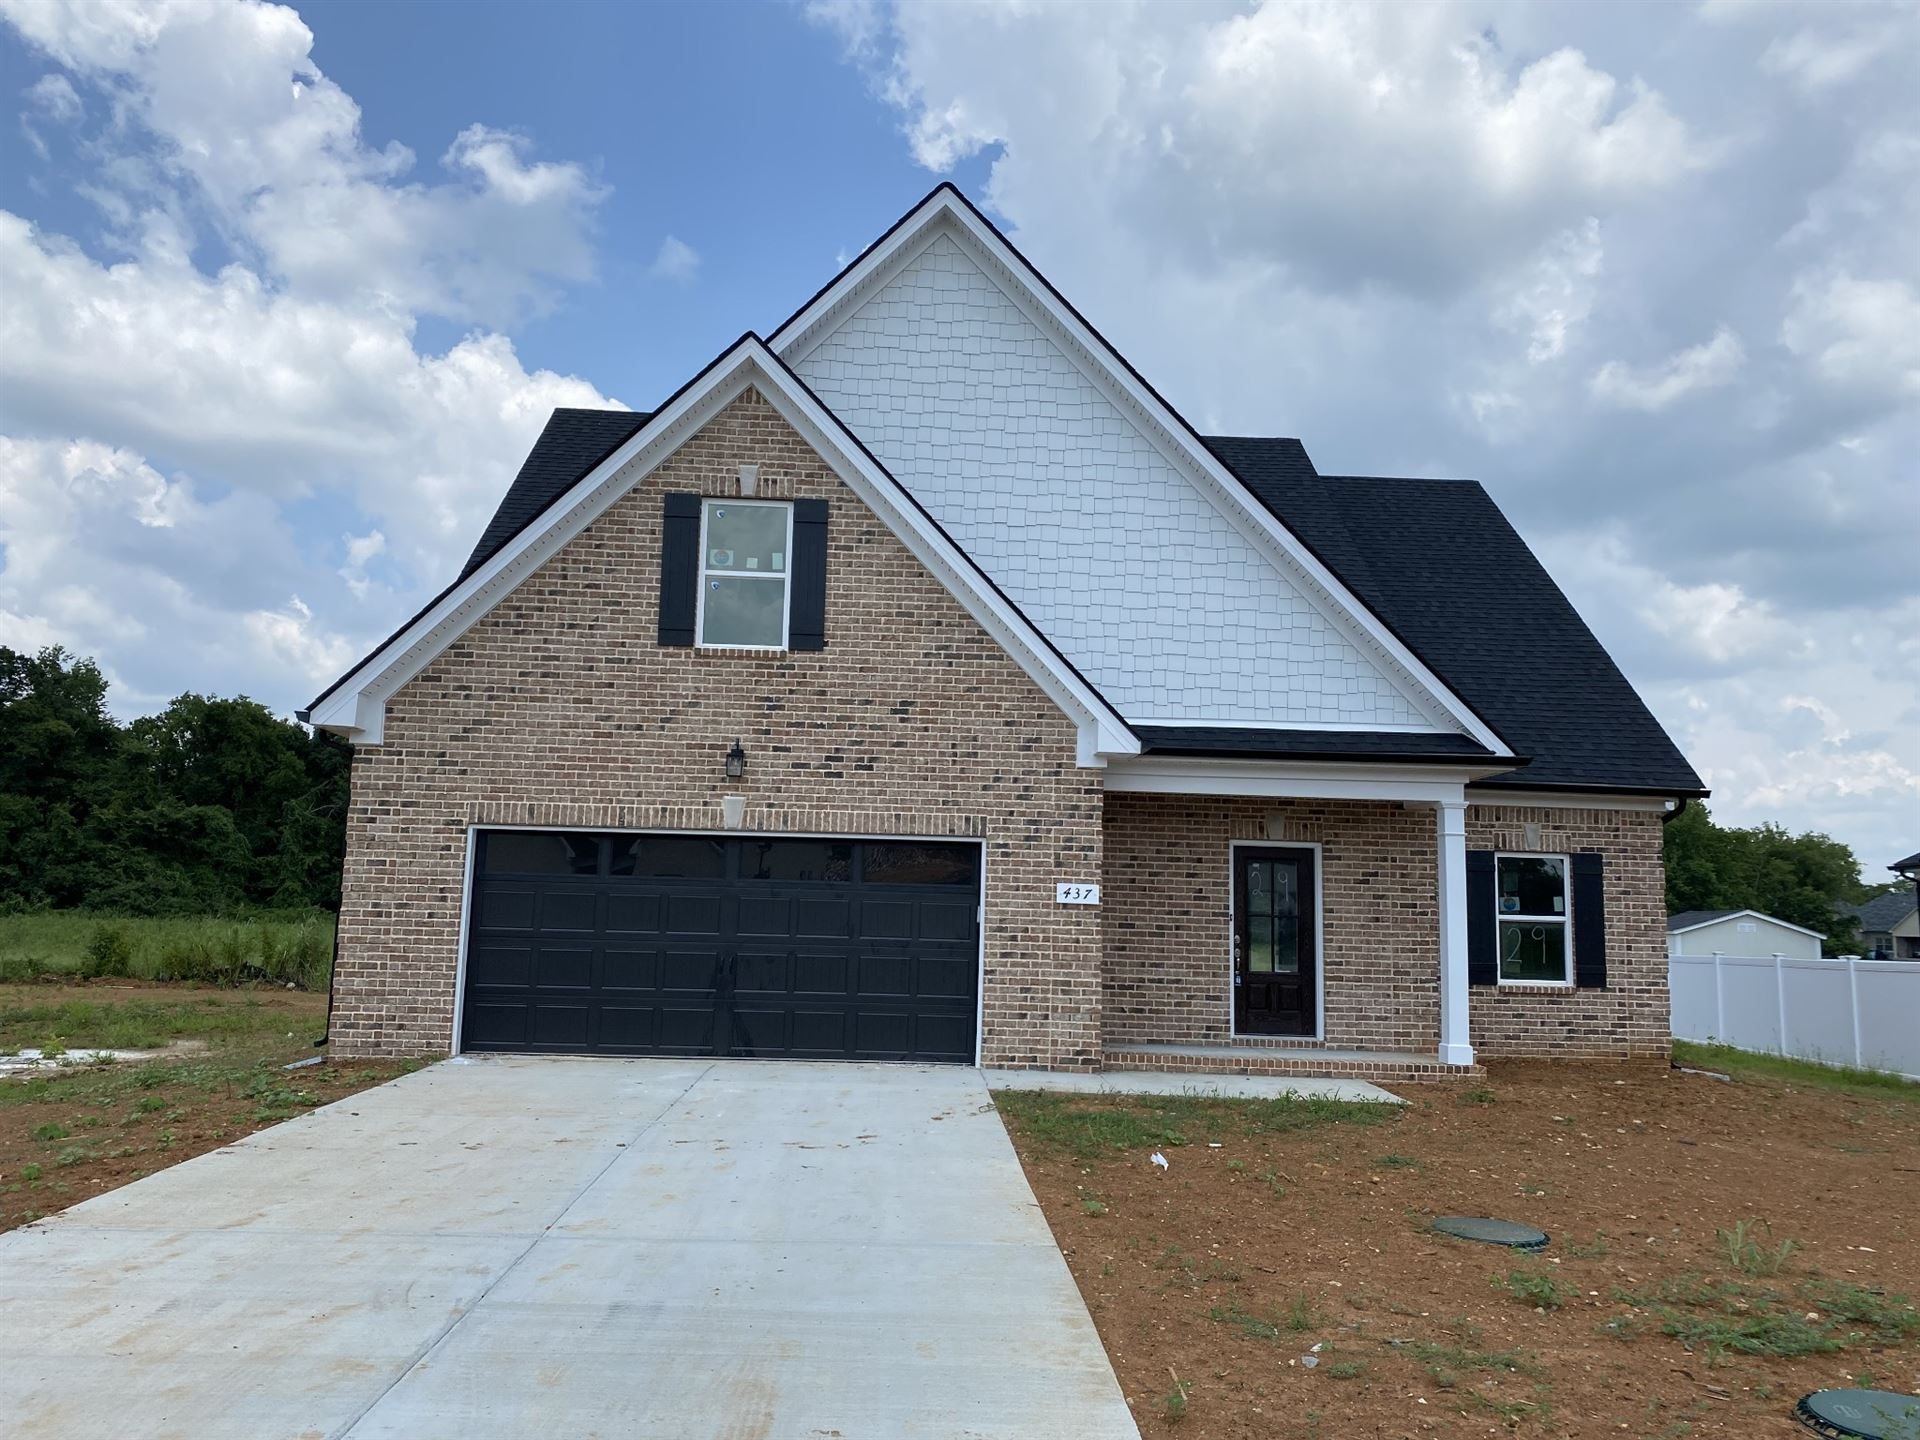 437 Beulah Rose Dr Lot 29, Murfreesboro, TN 37128 - MLS#: 2275954